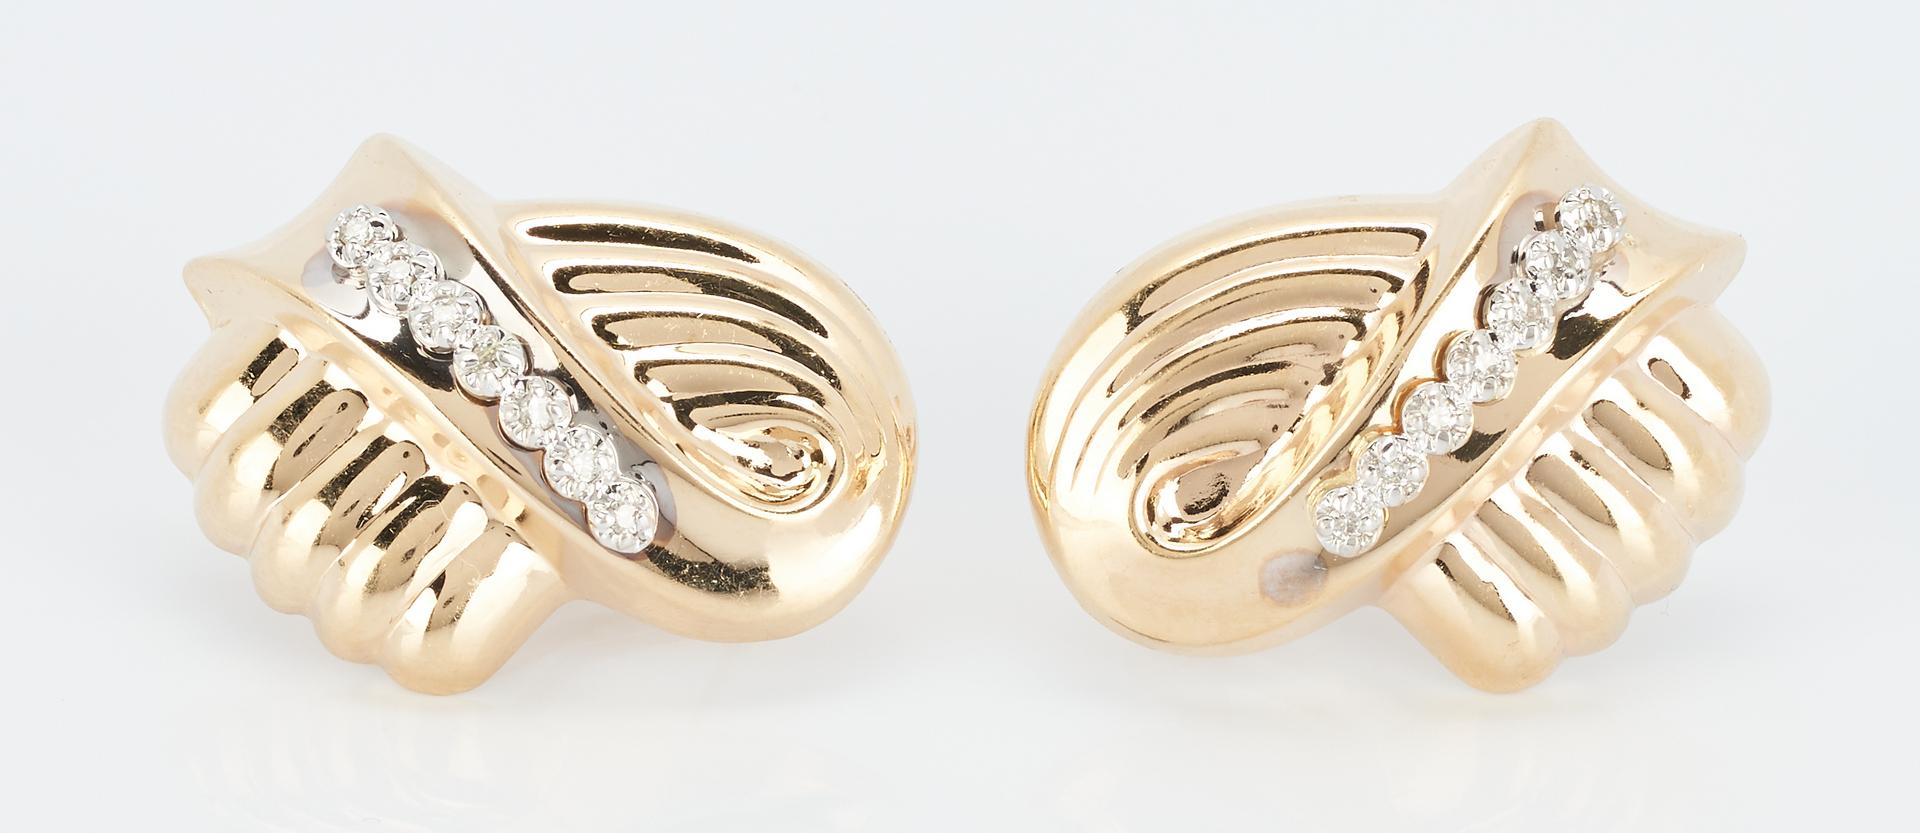 Lot 496: 4 Pairs Ladies 14K Yellow Gold Earrings